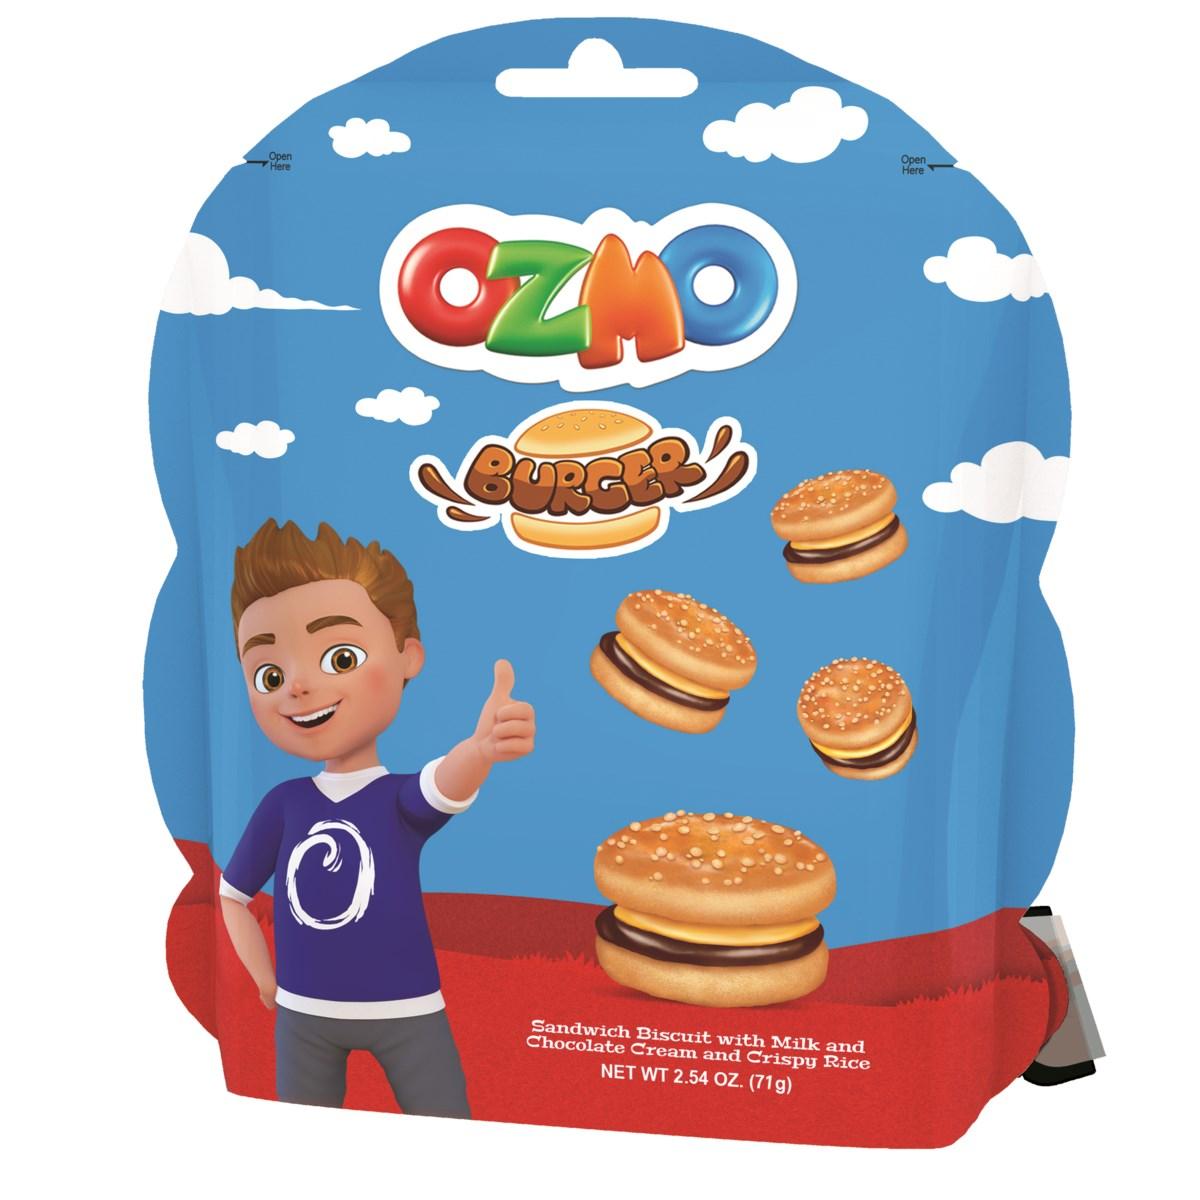 OZMO BURGER CHOCOLATE CREAM COOKIES 71GRX8